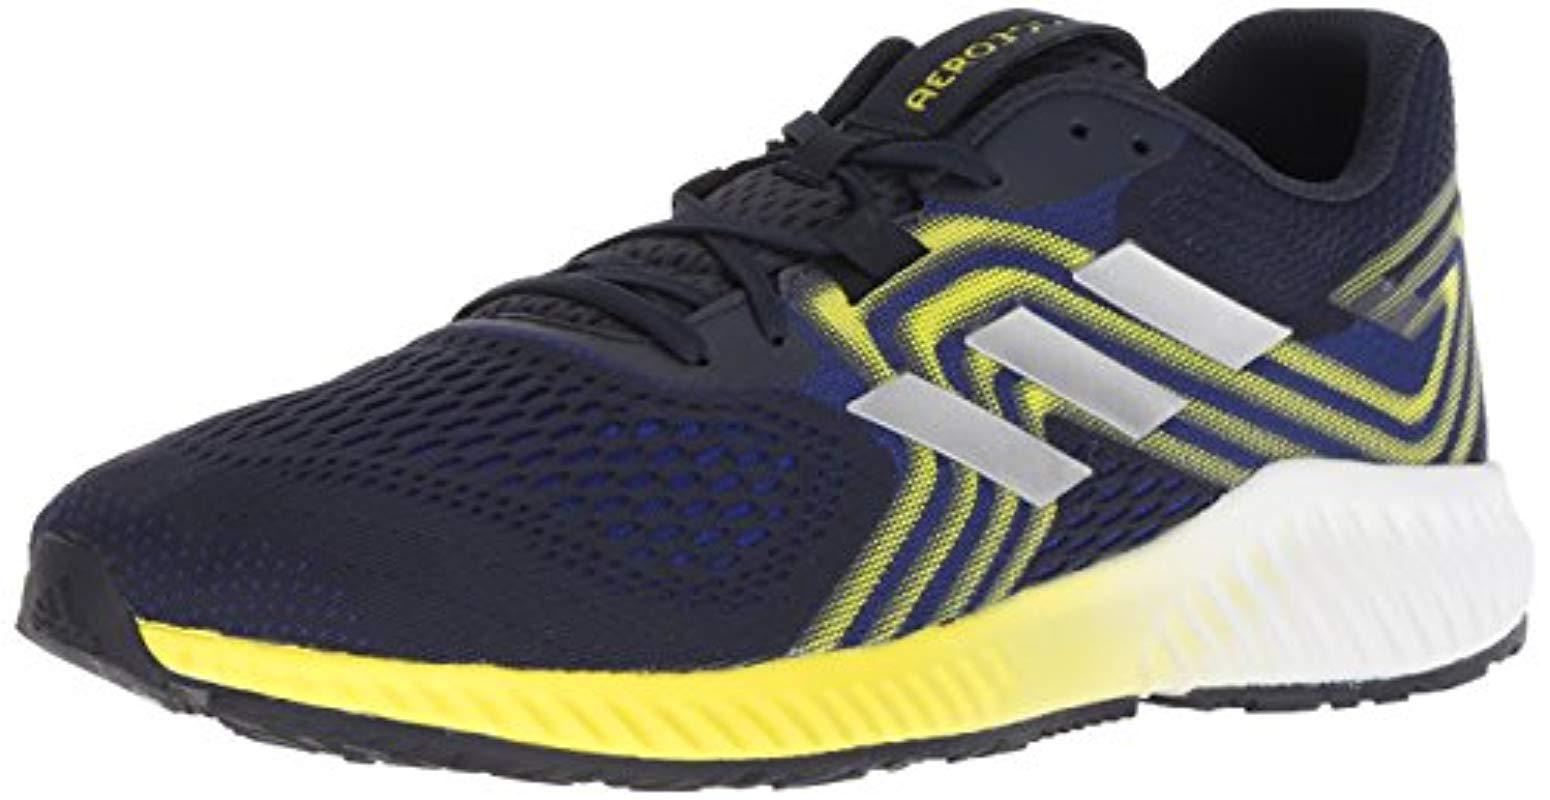 fe1120940851 adidas Originals Aerobounce 2 Running Shoe in Blue for Men - Lyst